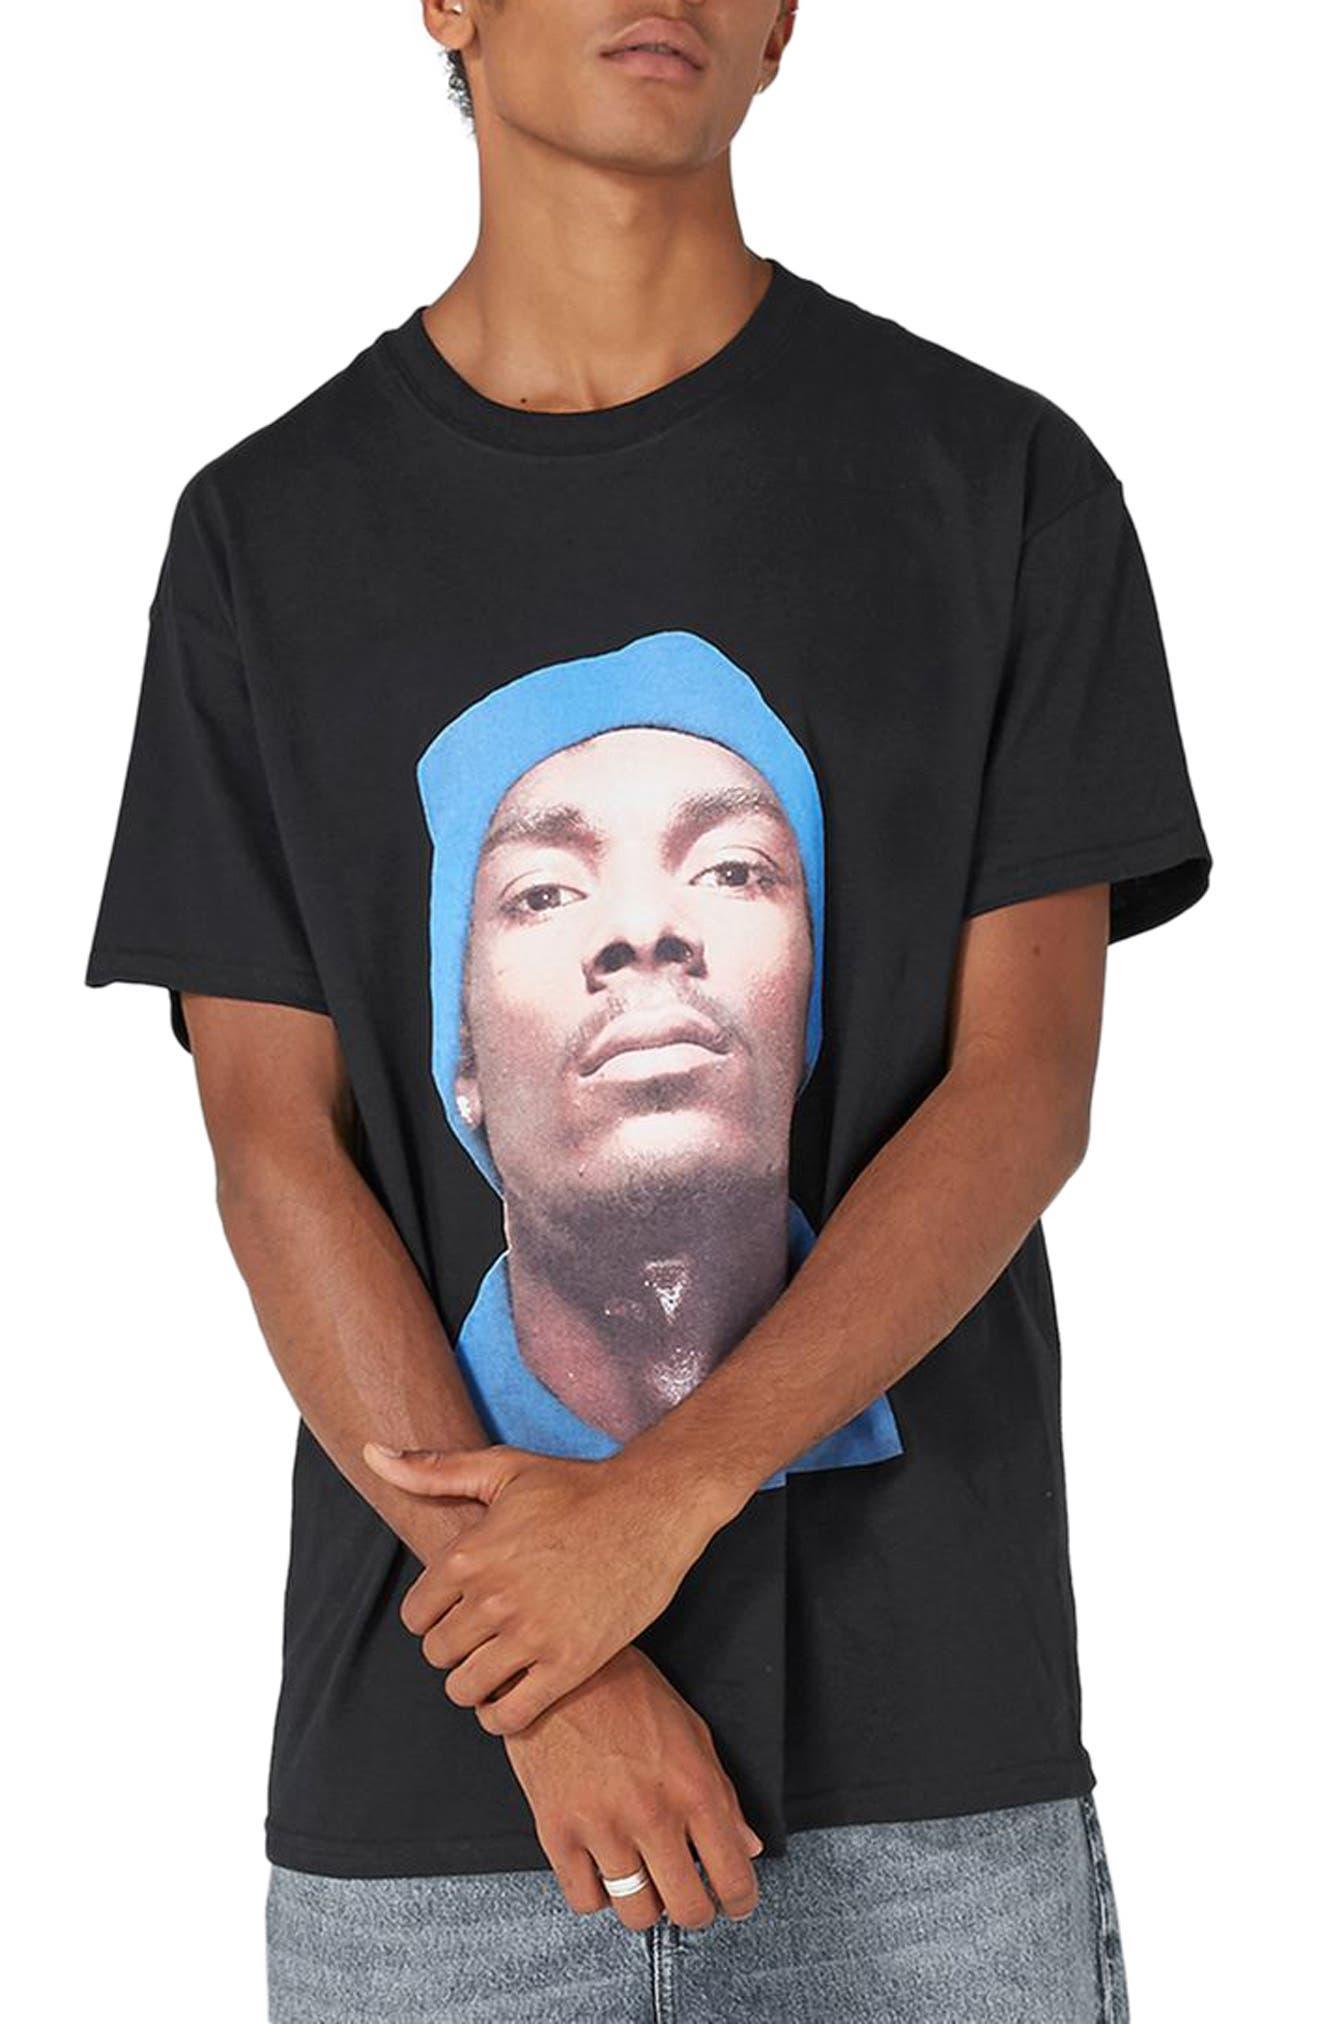 Snoop Dogg T-Shirt,                             Main thumbnail 1, color,                             Black Multi